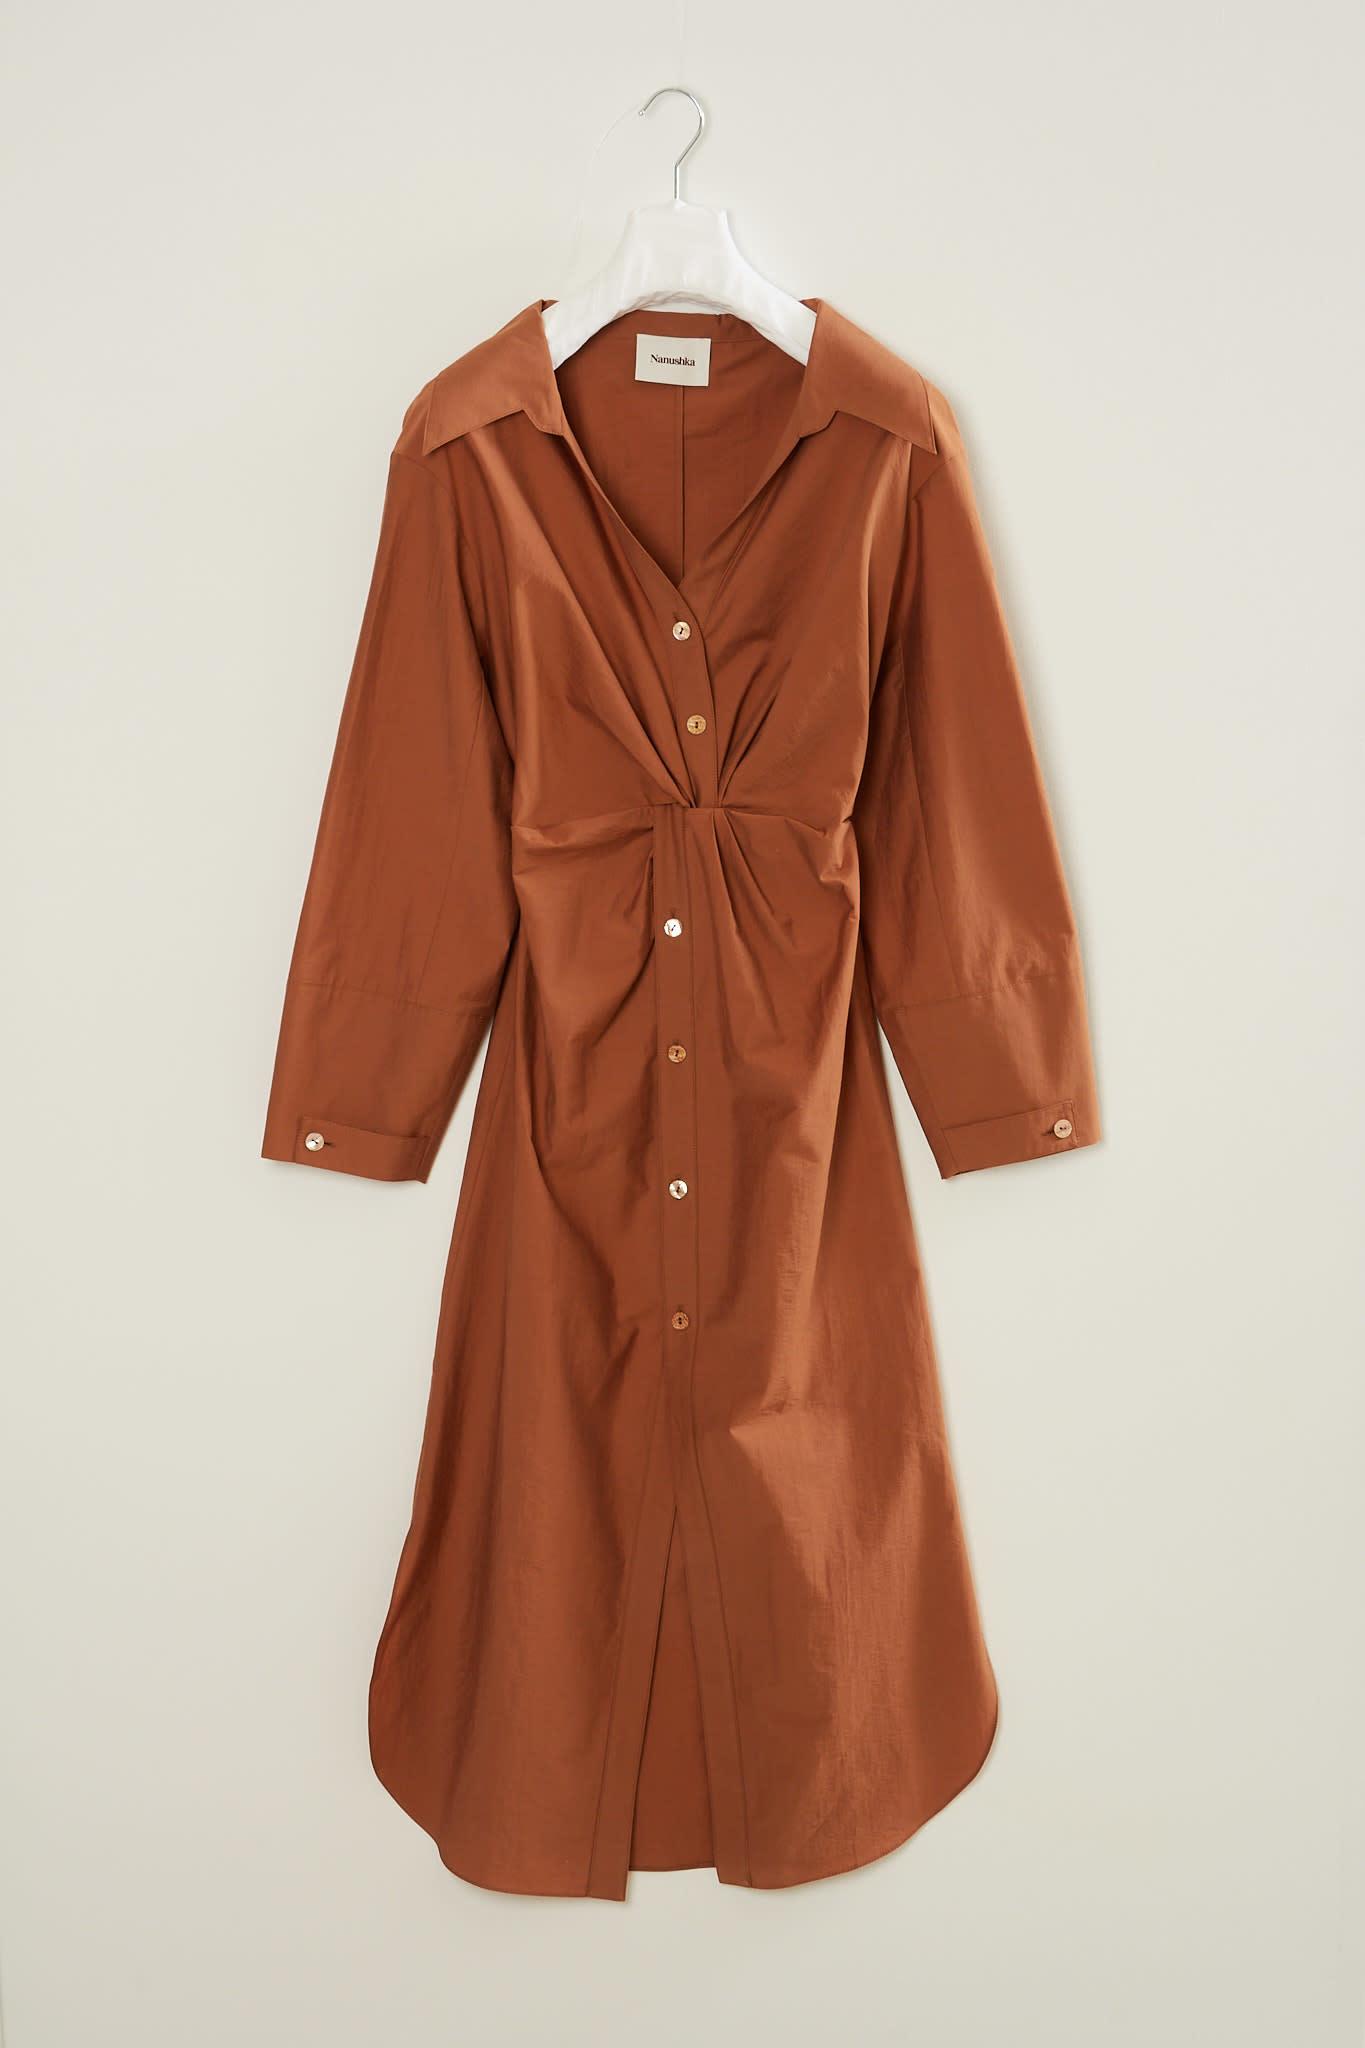 Nanushka - Ayse crisp poplin dress